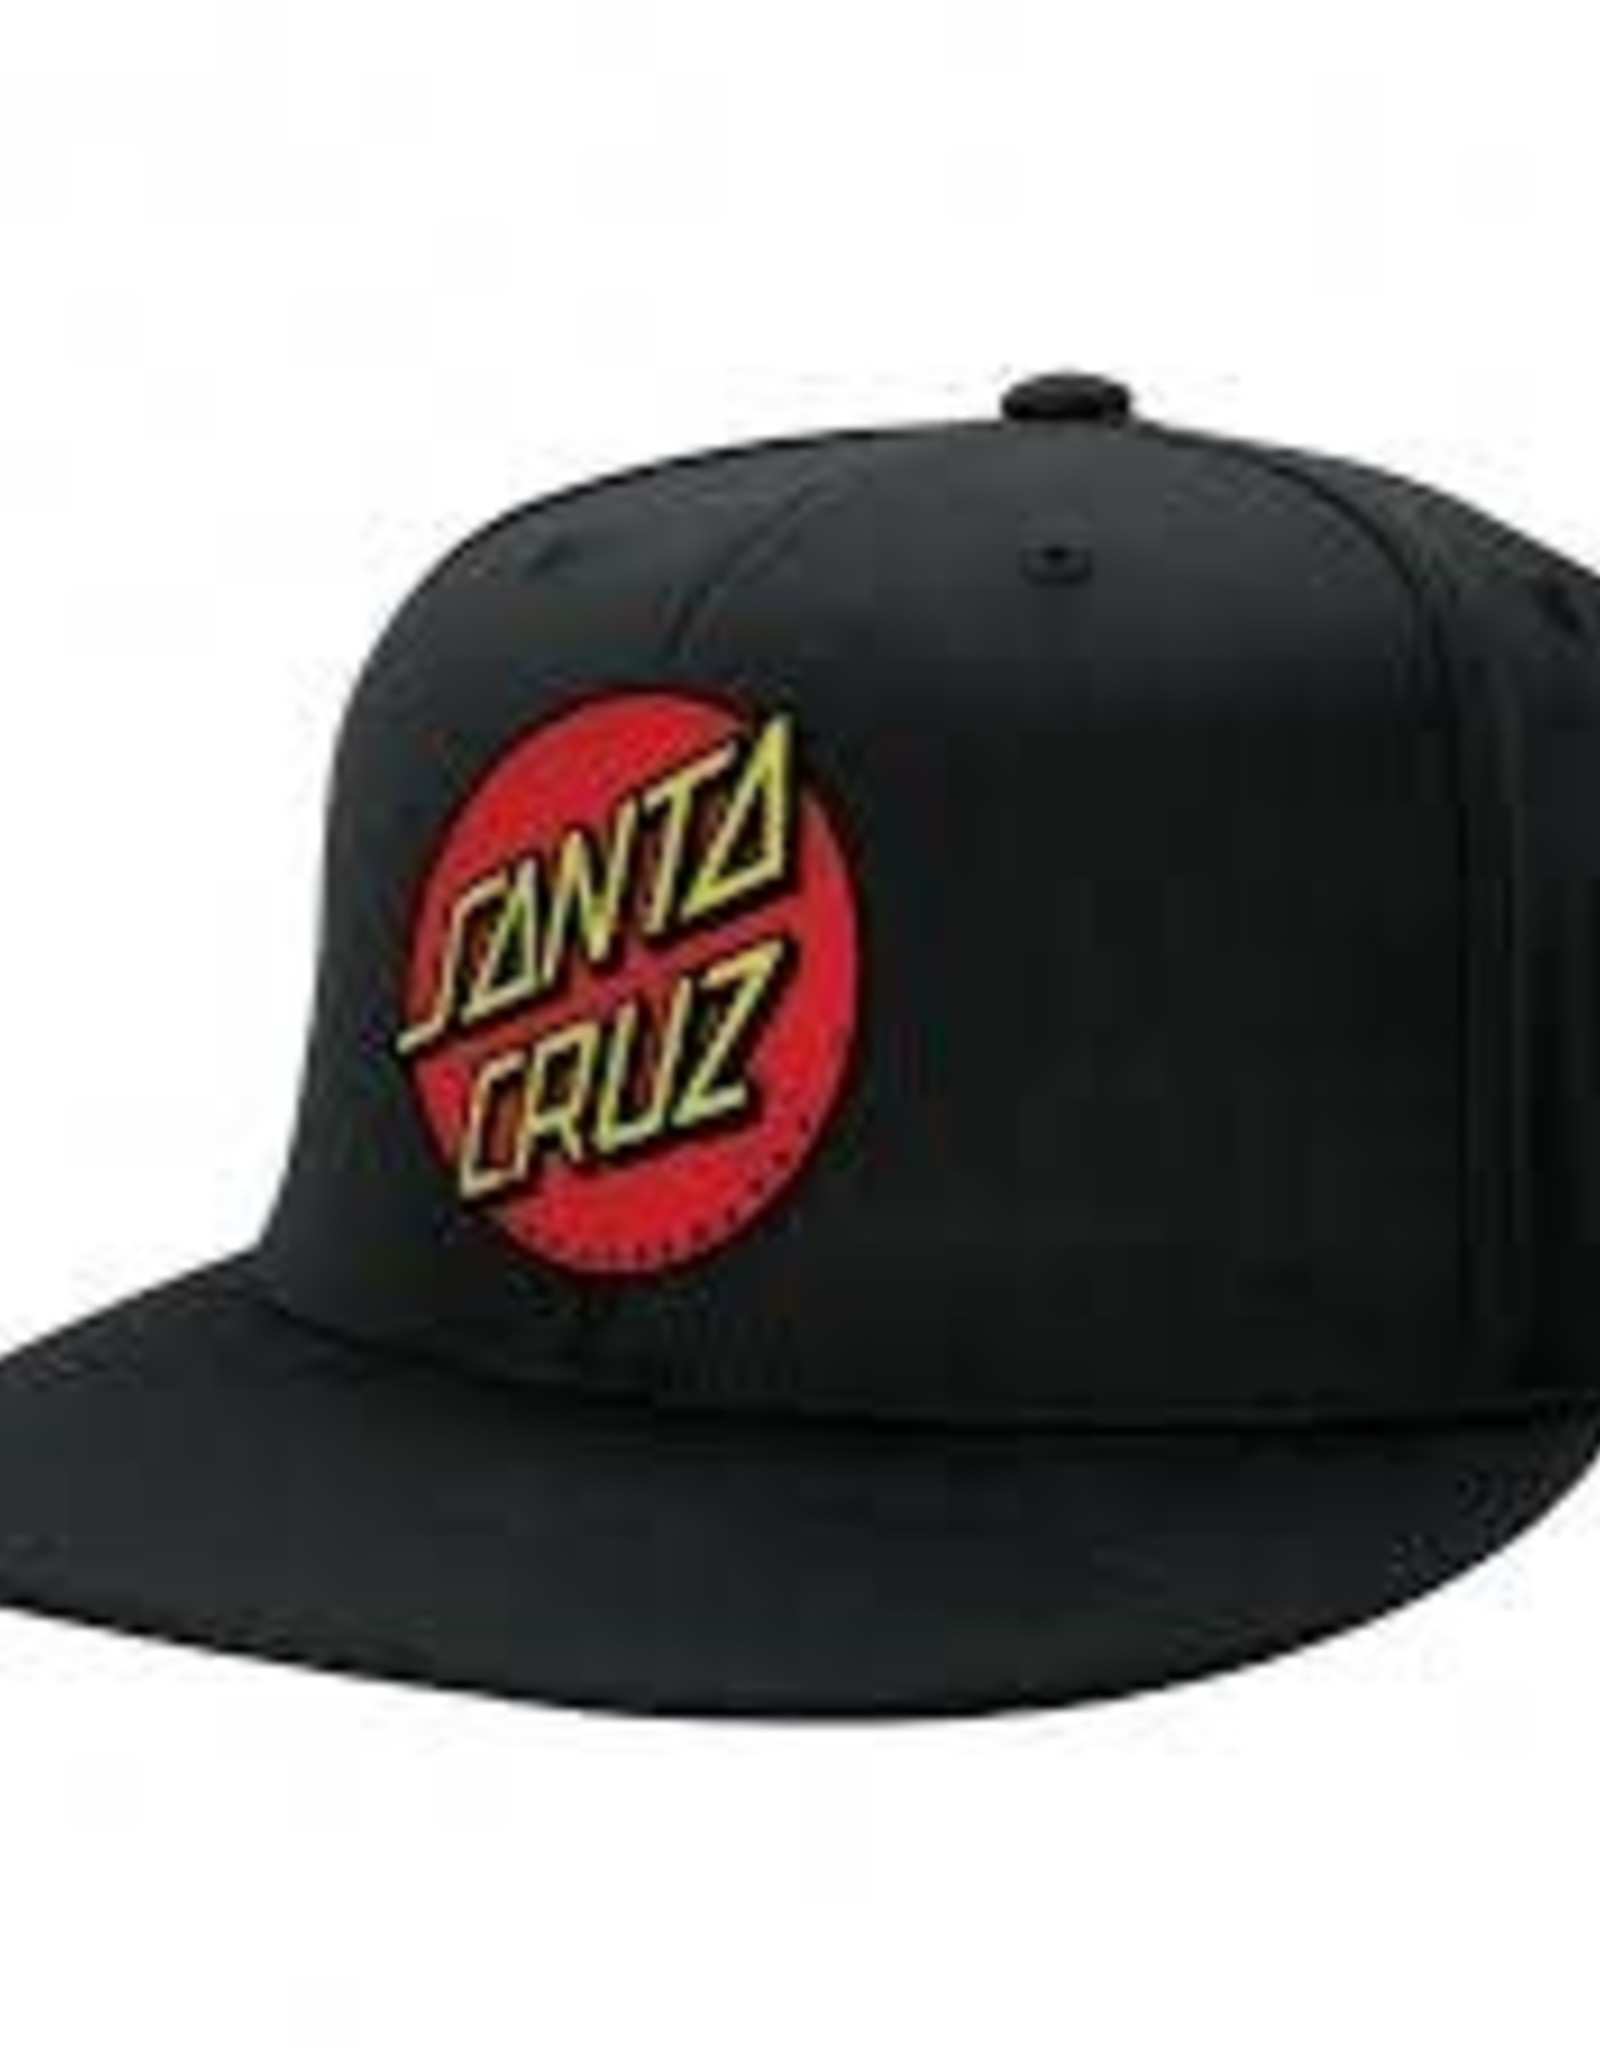 Santa Cruz FlexFit 6 7/8 - 7 1/4